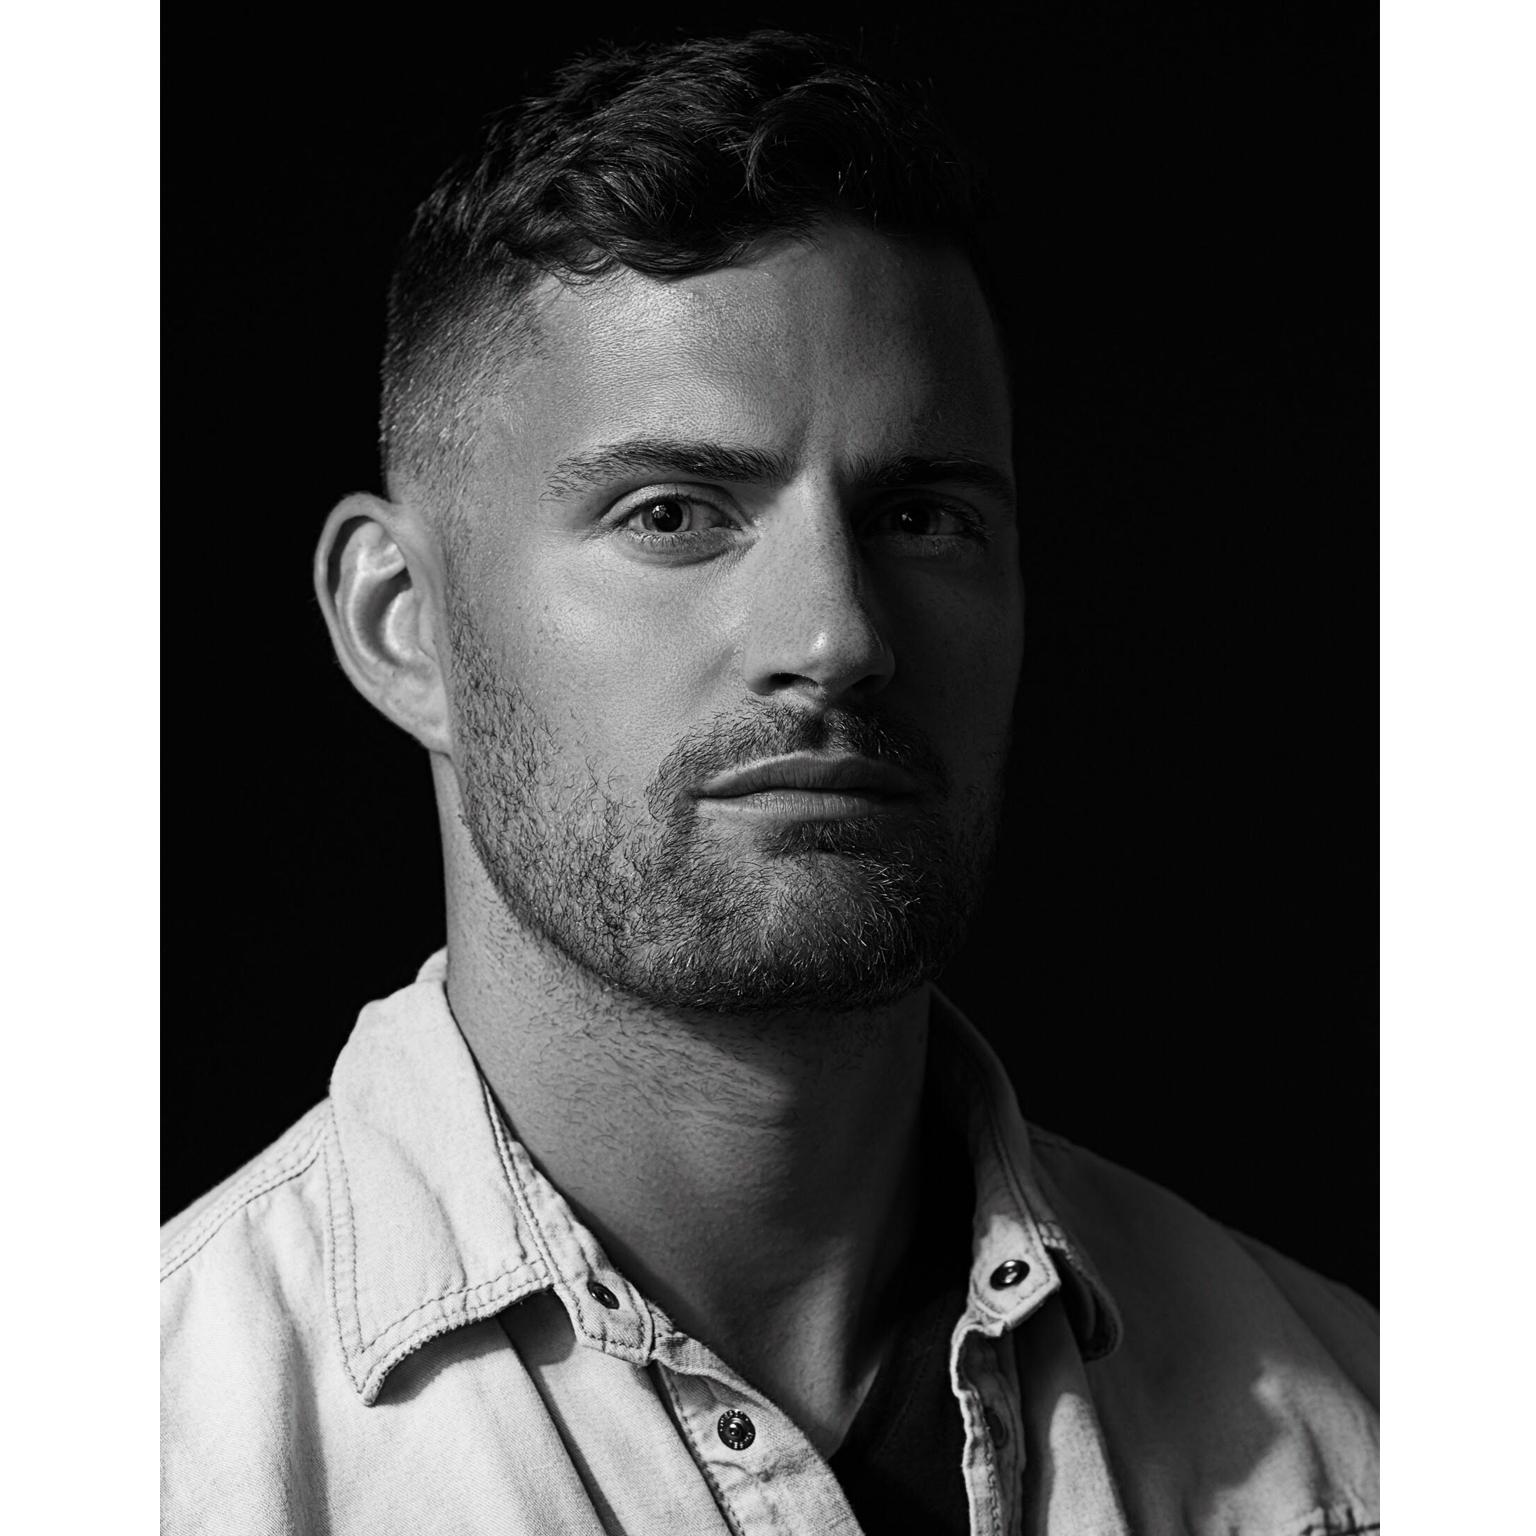 Toronto-Fitness-Model-Agency-Mood-Portrait-Justin-Baker